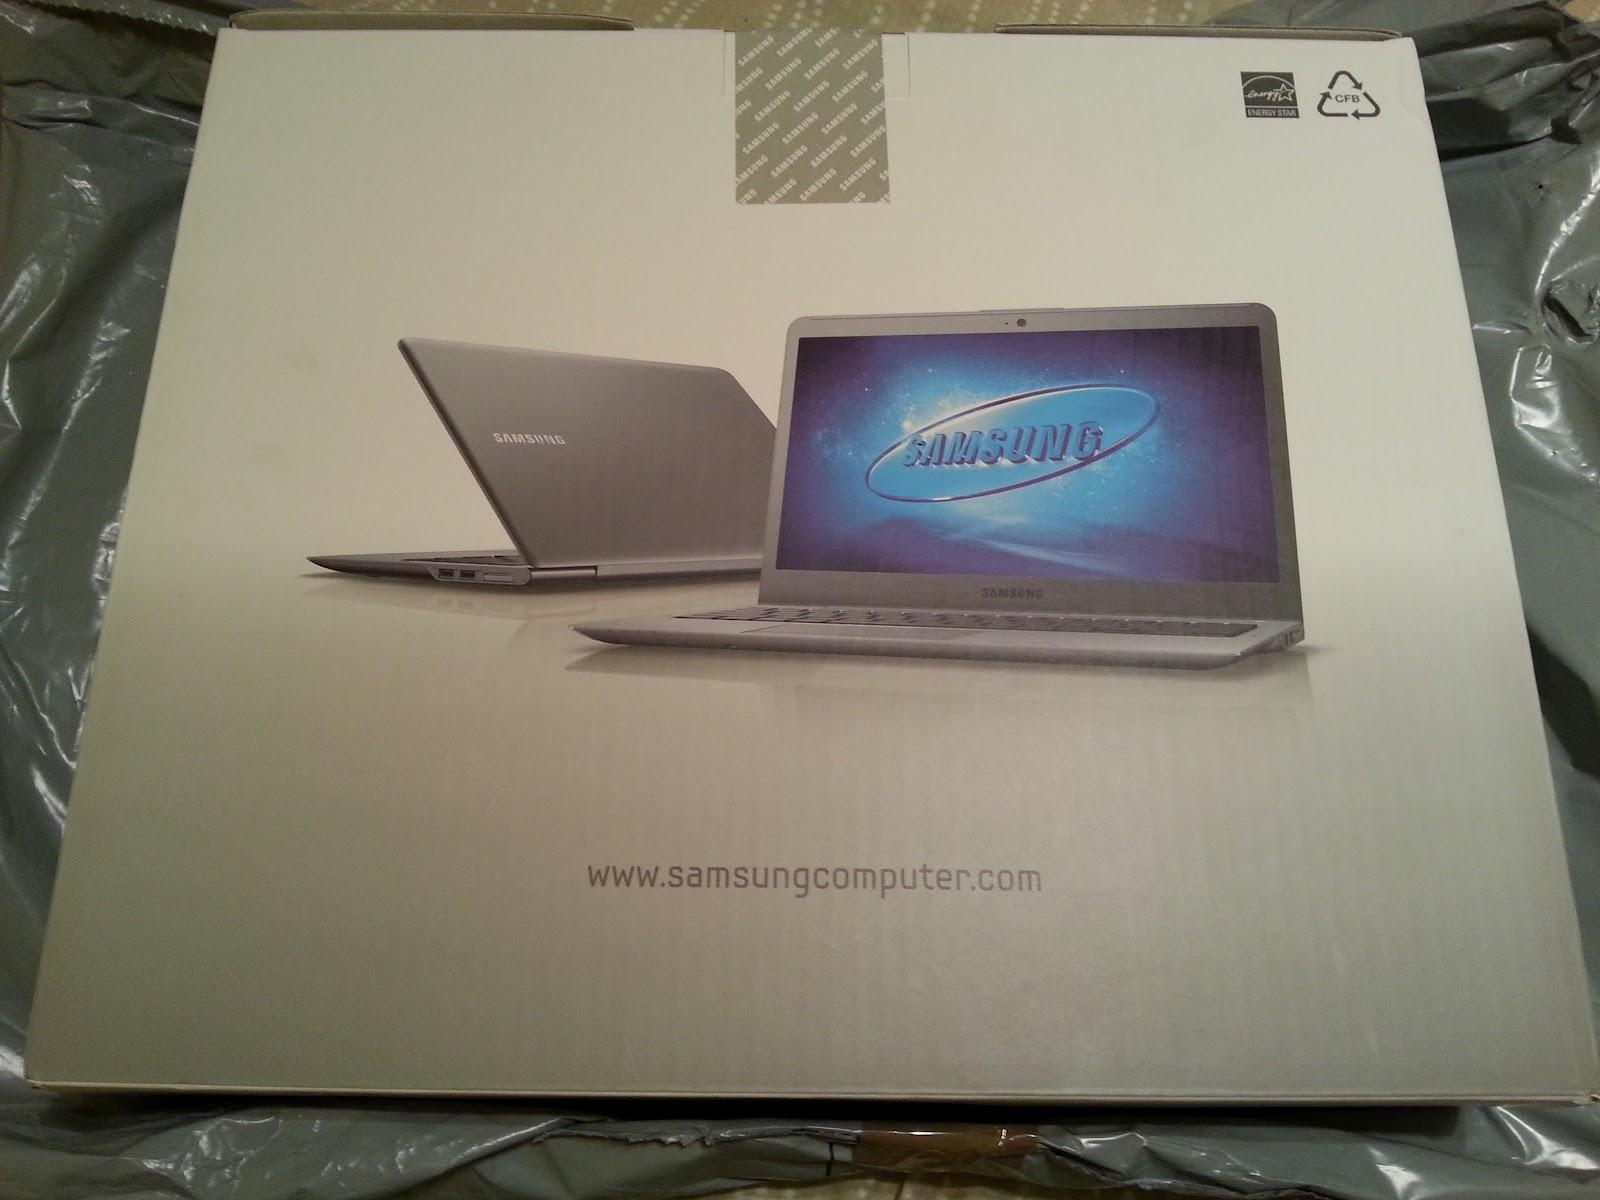 Ma10 Diy Wifi Music System Daap Nexus One Homemade Laptop Amplifier Review Notebookreviewcom I Did Not Buy A Macbook